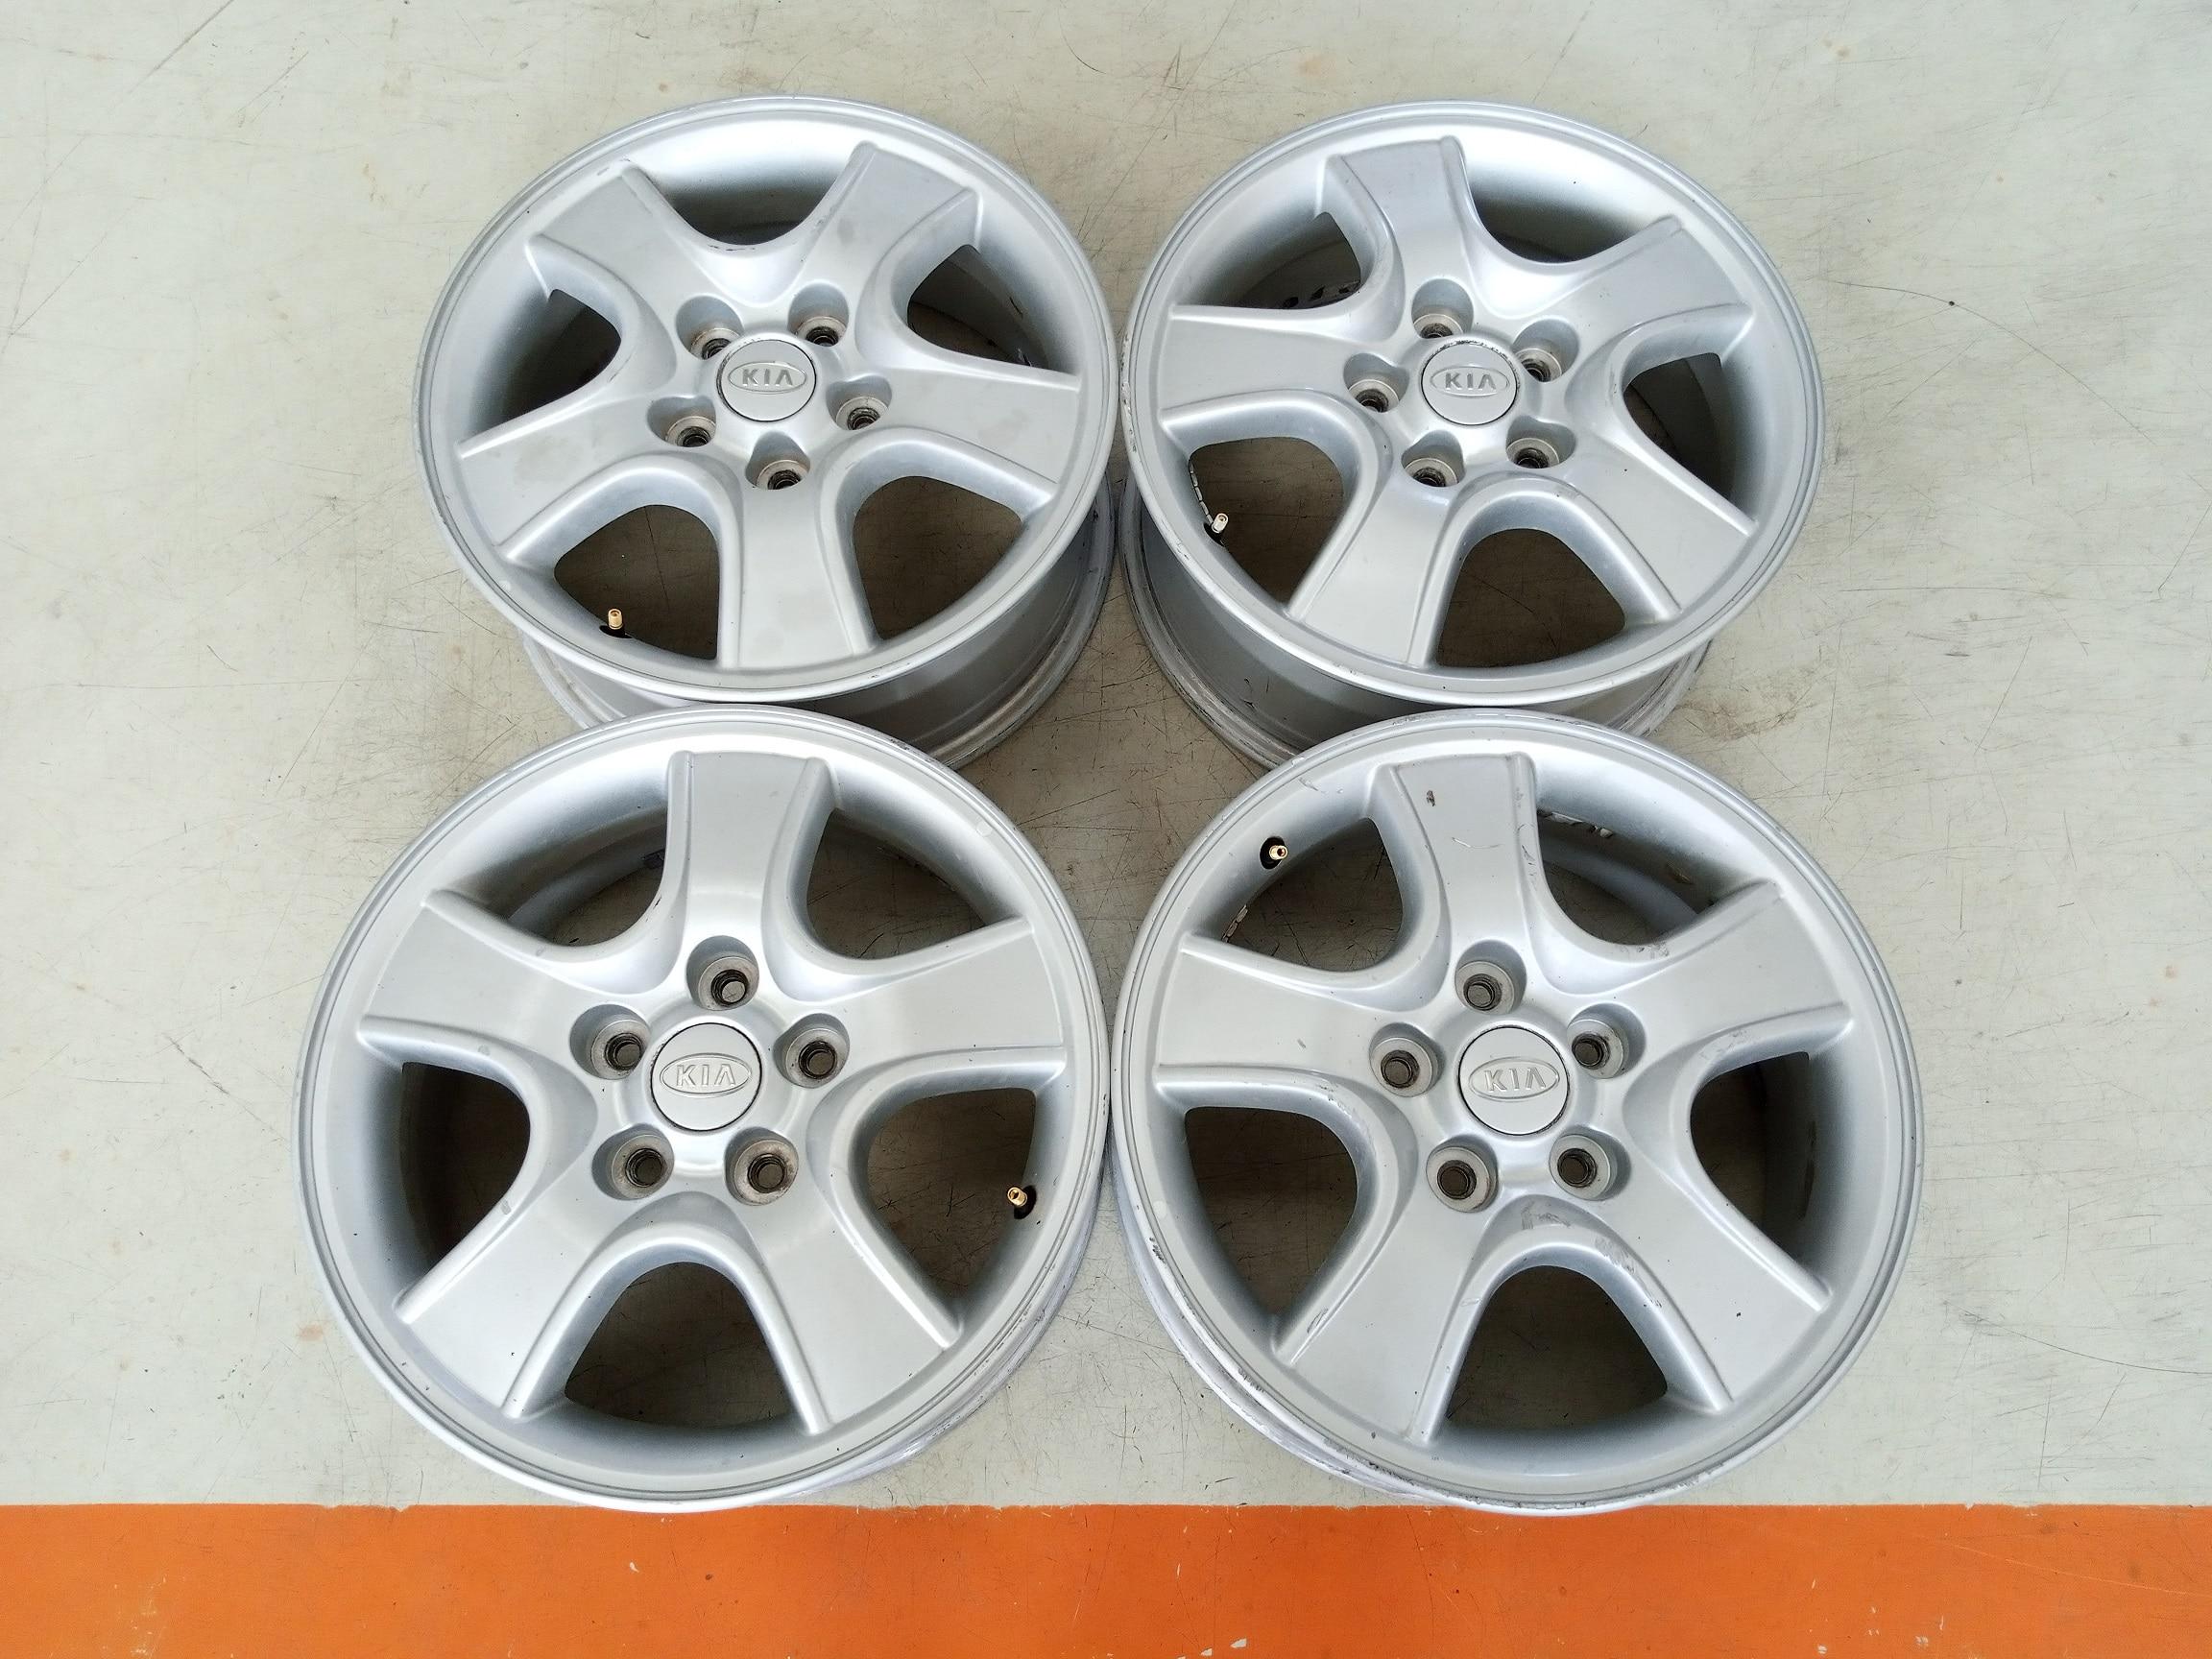 Velg Bekas Oem Hyundai KIA Sportage Ring 16 H:5×114,3 Silver